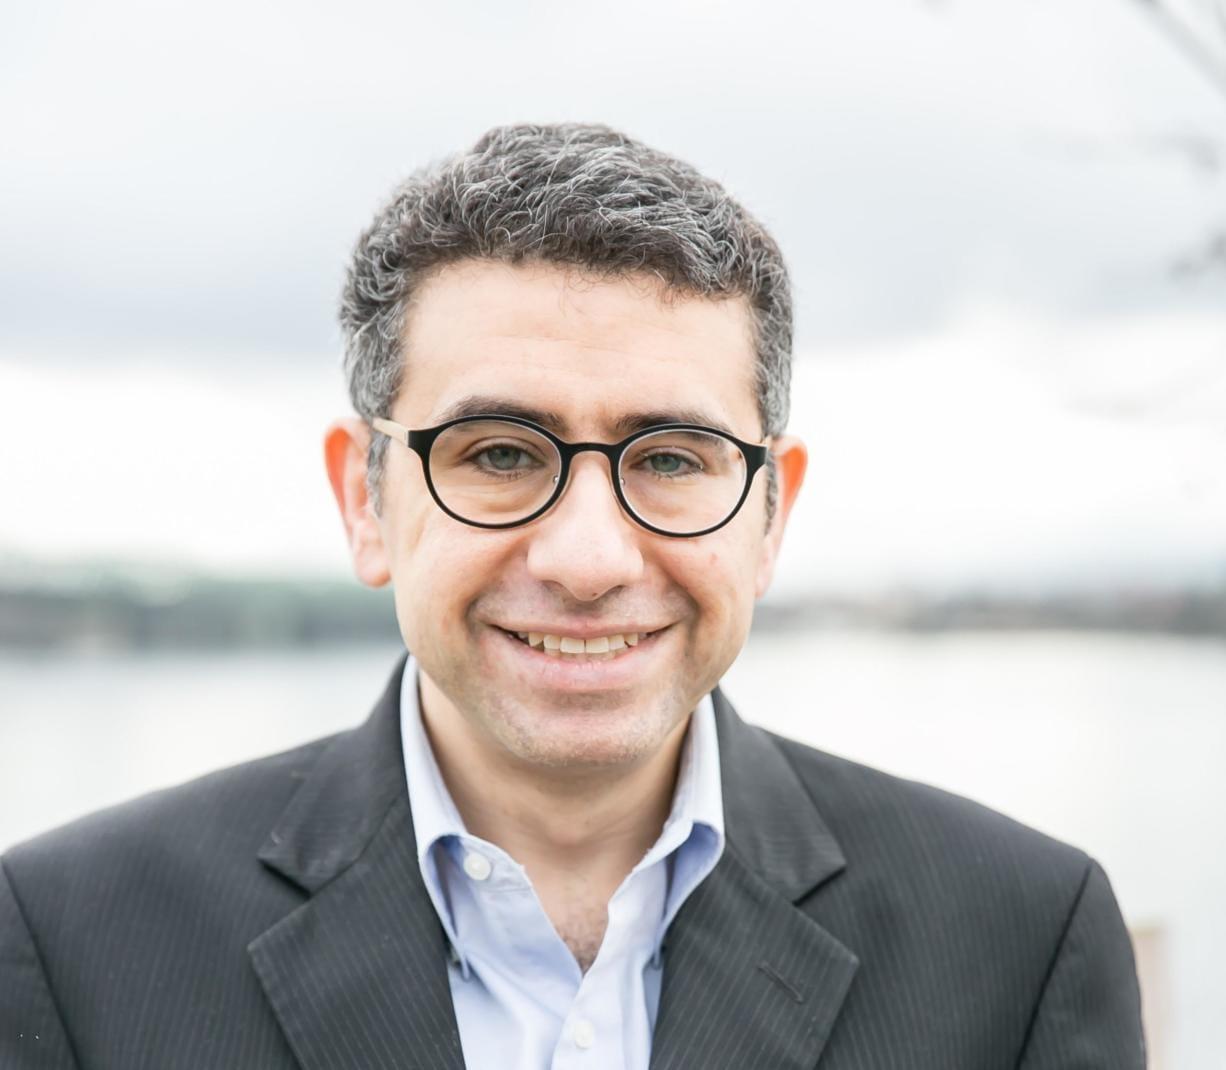 Peter Khalil